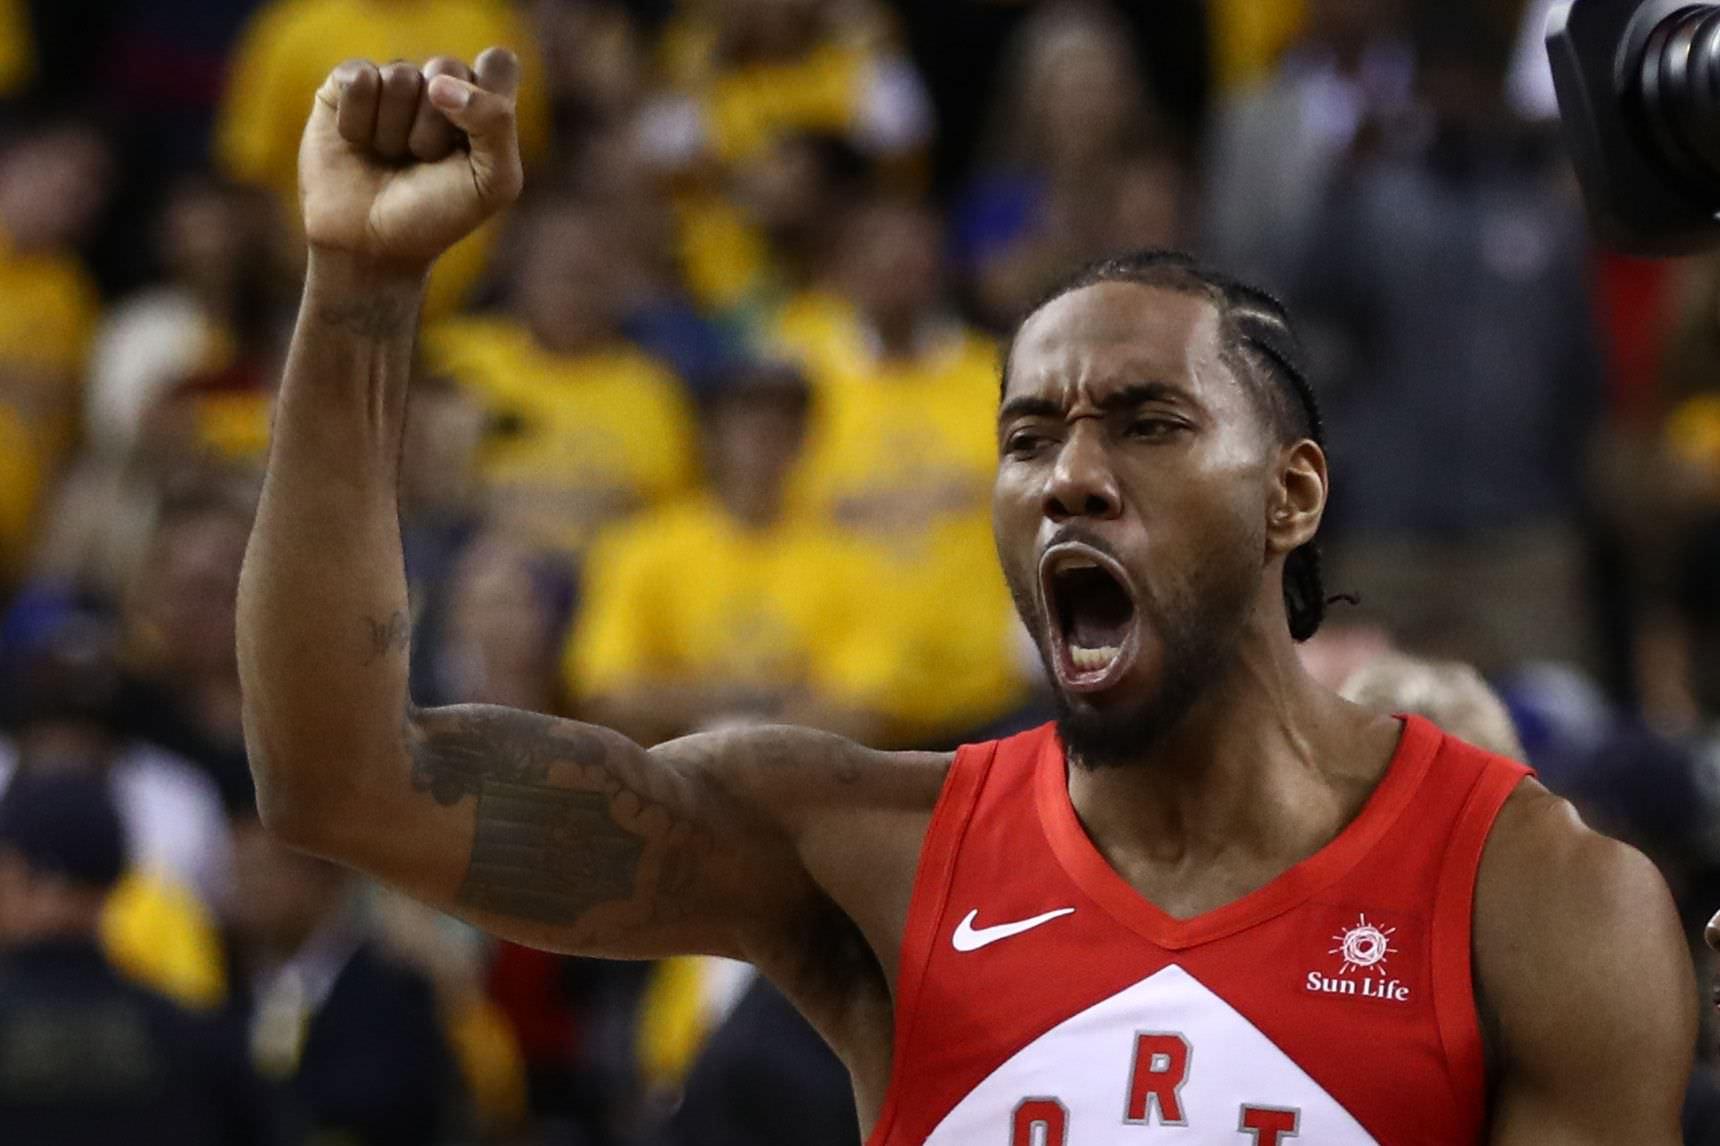 Report: Kawhi ainda indeciso entre Raptors, Lakers, Clippers – Yahoo Sports